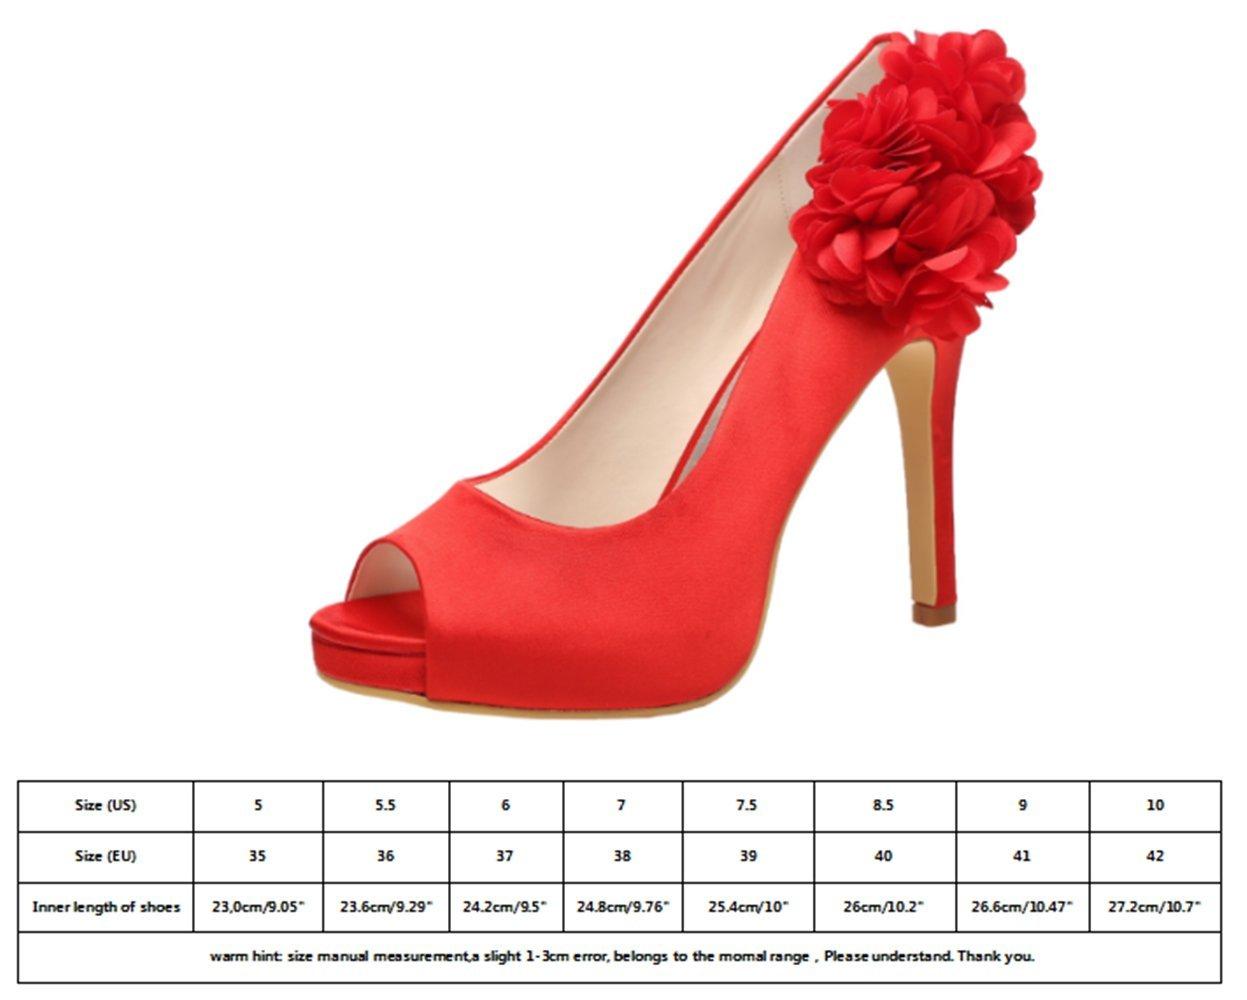 M MULGARIA Women High Heel Pumps Platform Peep Toe Flowers Satin Evening Prom Wedding Shoes B0791DRZXX EU 40/8.5B(M)US|Red